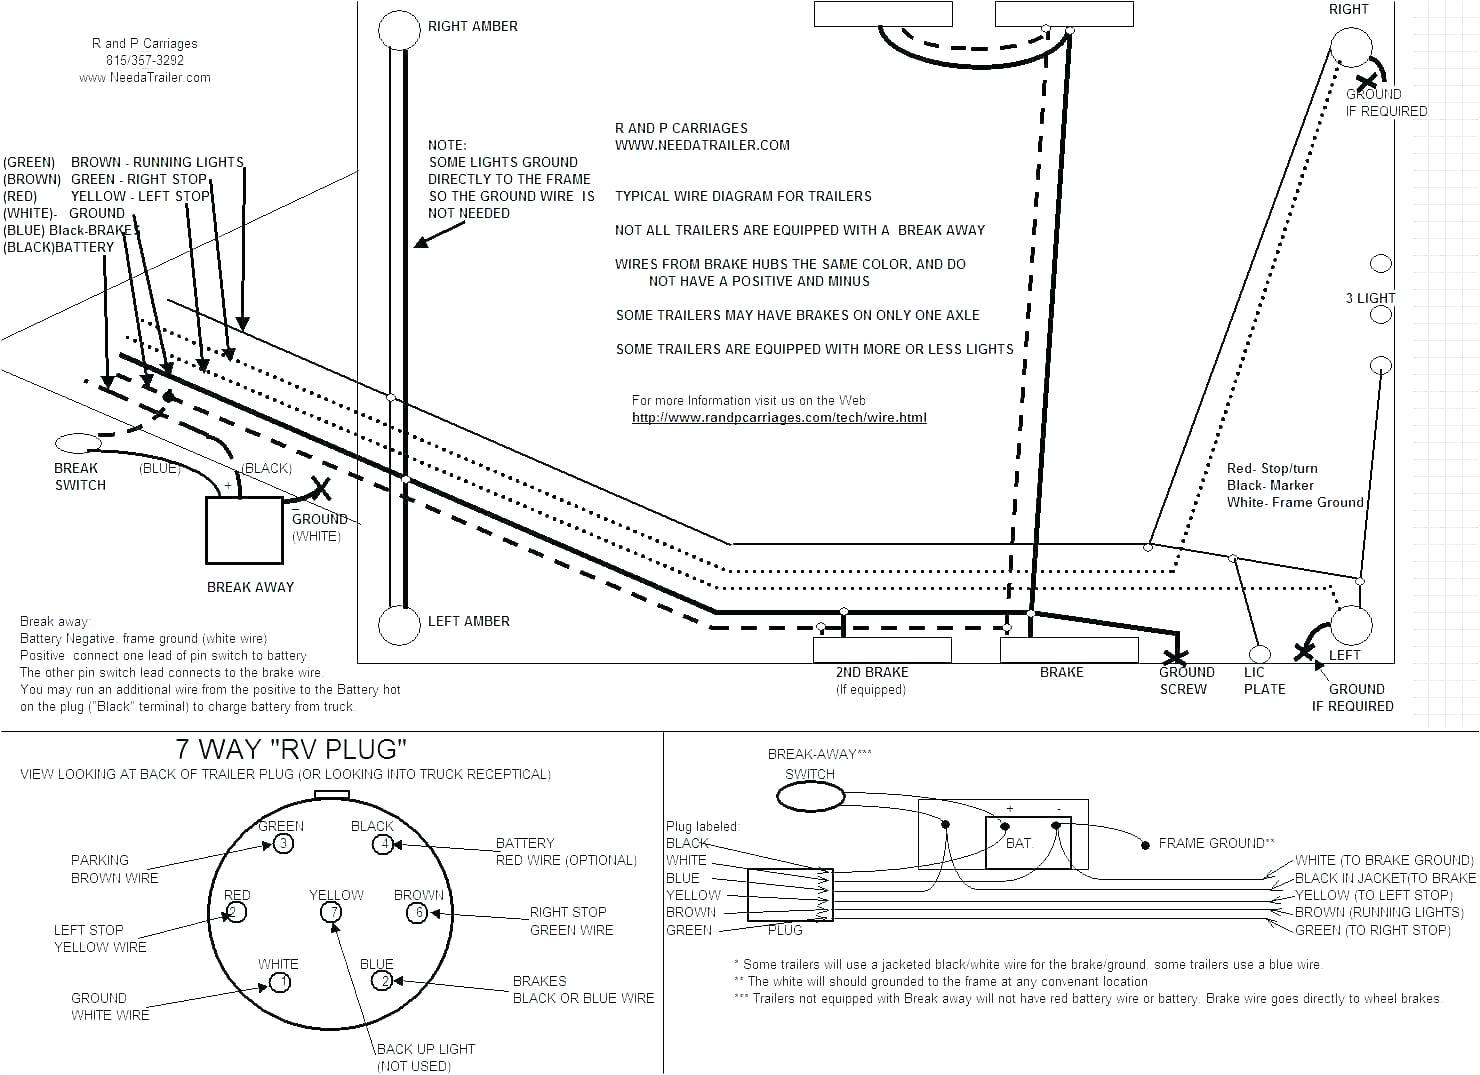 Tekonsha Prodigy P3 Wiring Diagram Tekonsha Prodigy P2 Brake Controllerng Diagram with On Controller In